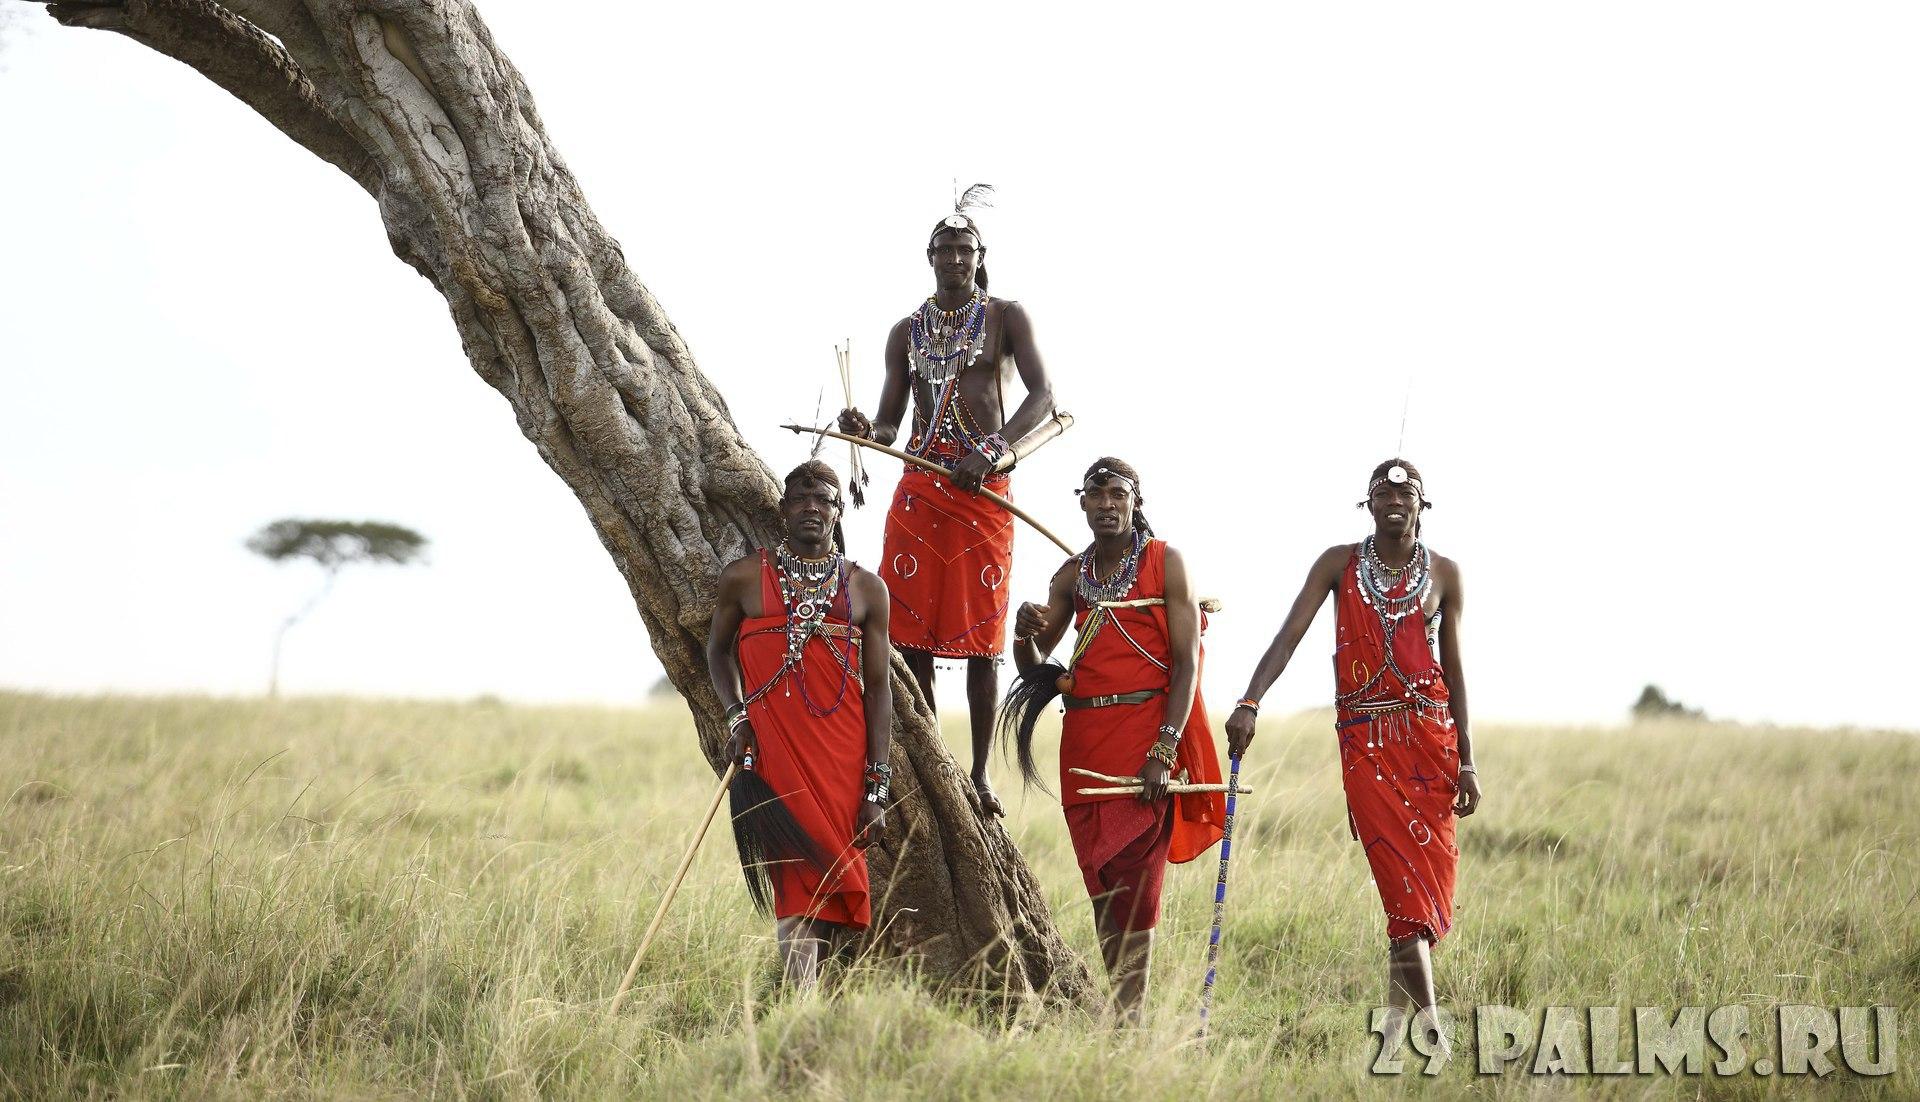 Masai naked pics erotic photos